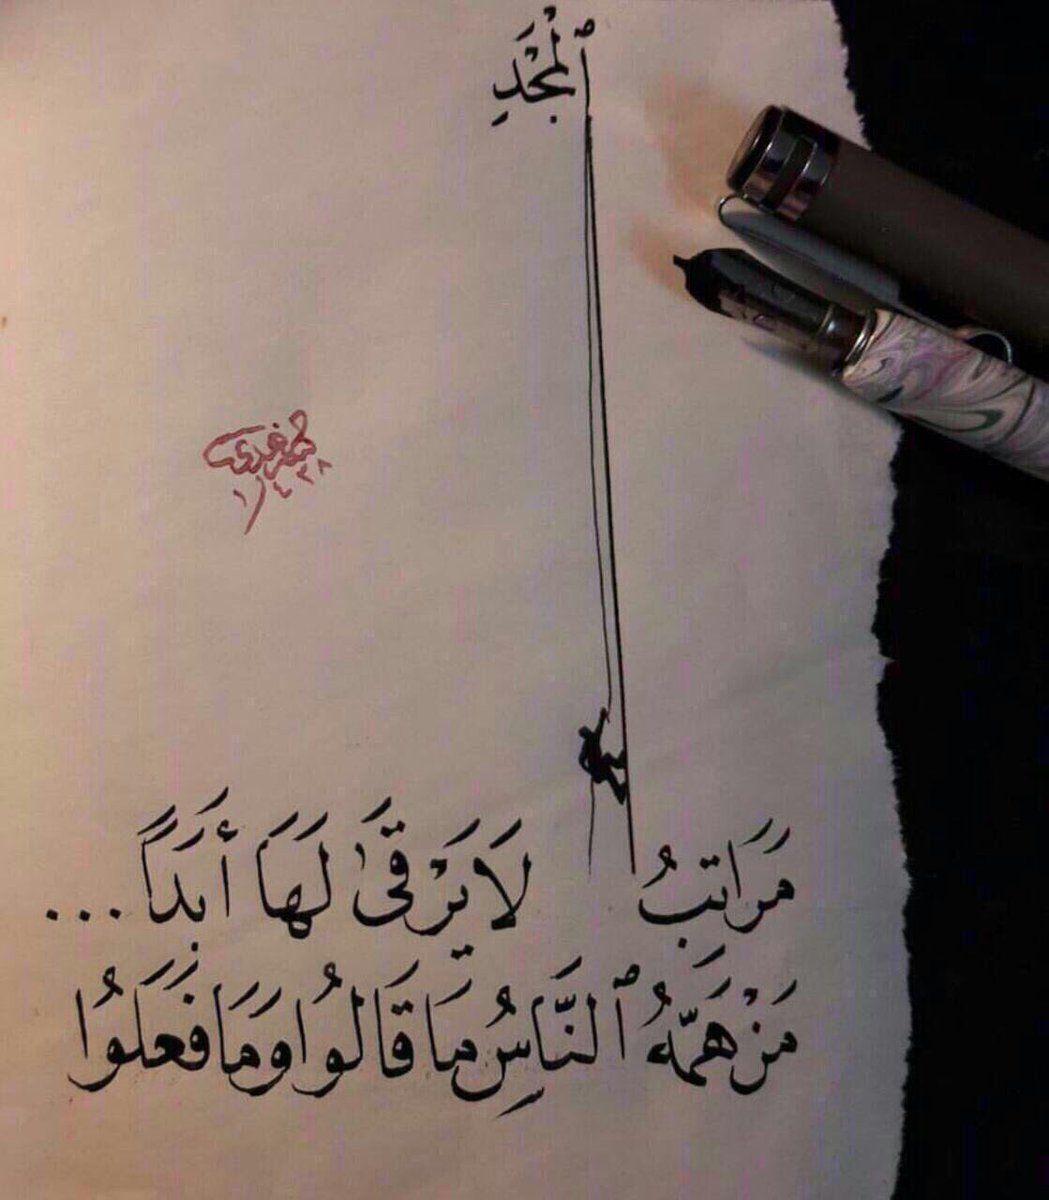 ف صحى Arabicadab1 Twitter Proverbs Quotes Poet Quotes Beautiful Arabic Words